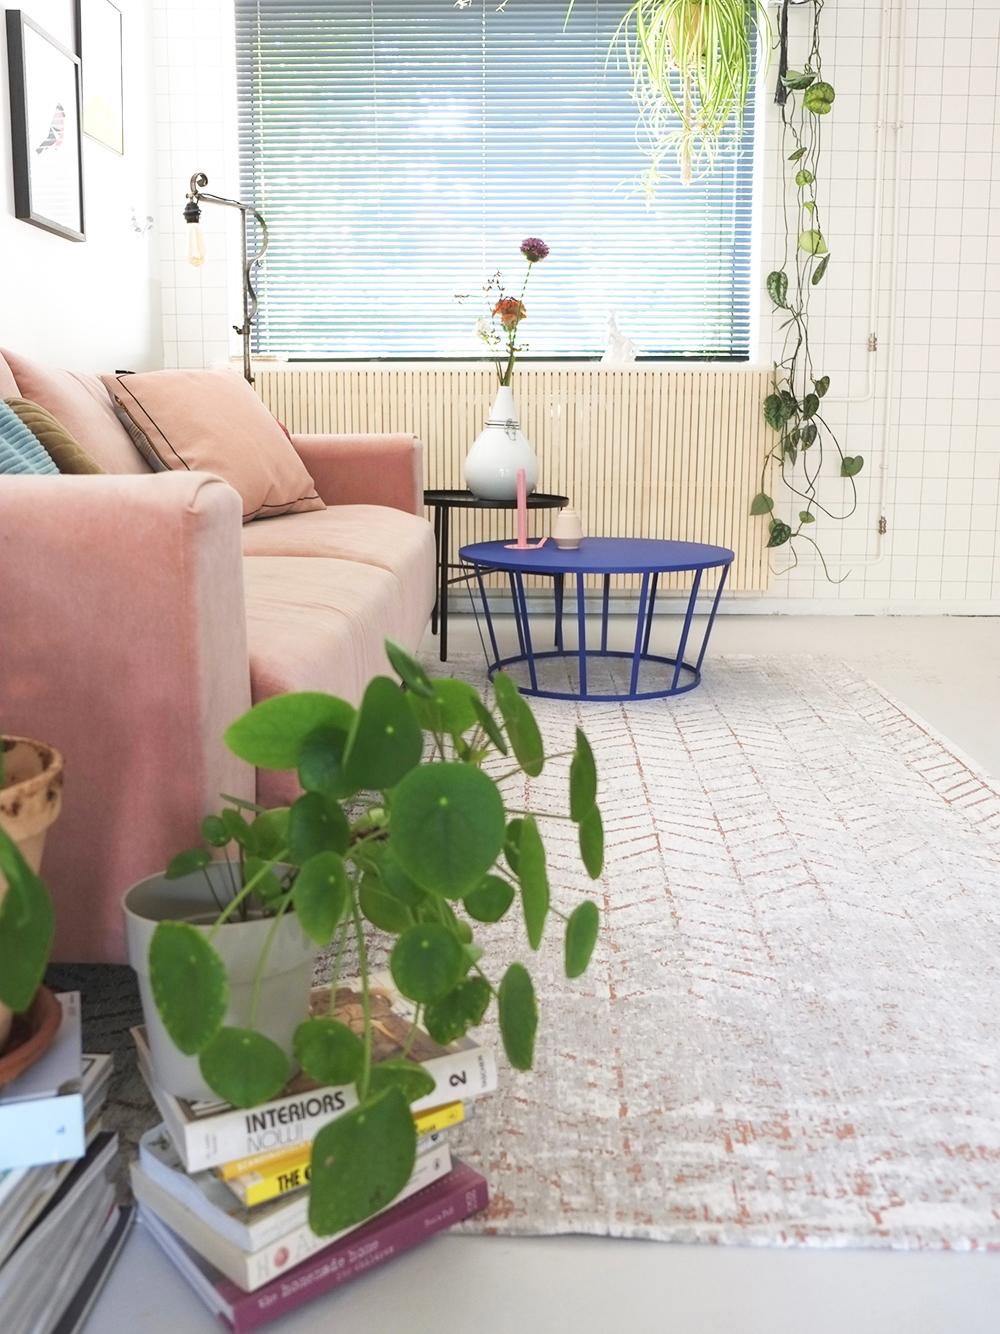 vloerkleed-interieuradvies-interieurstyling-woonideeen-interieurtips